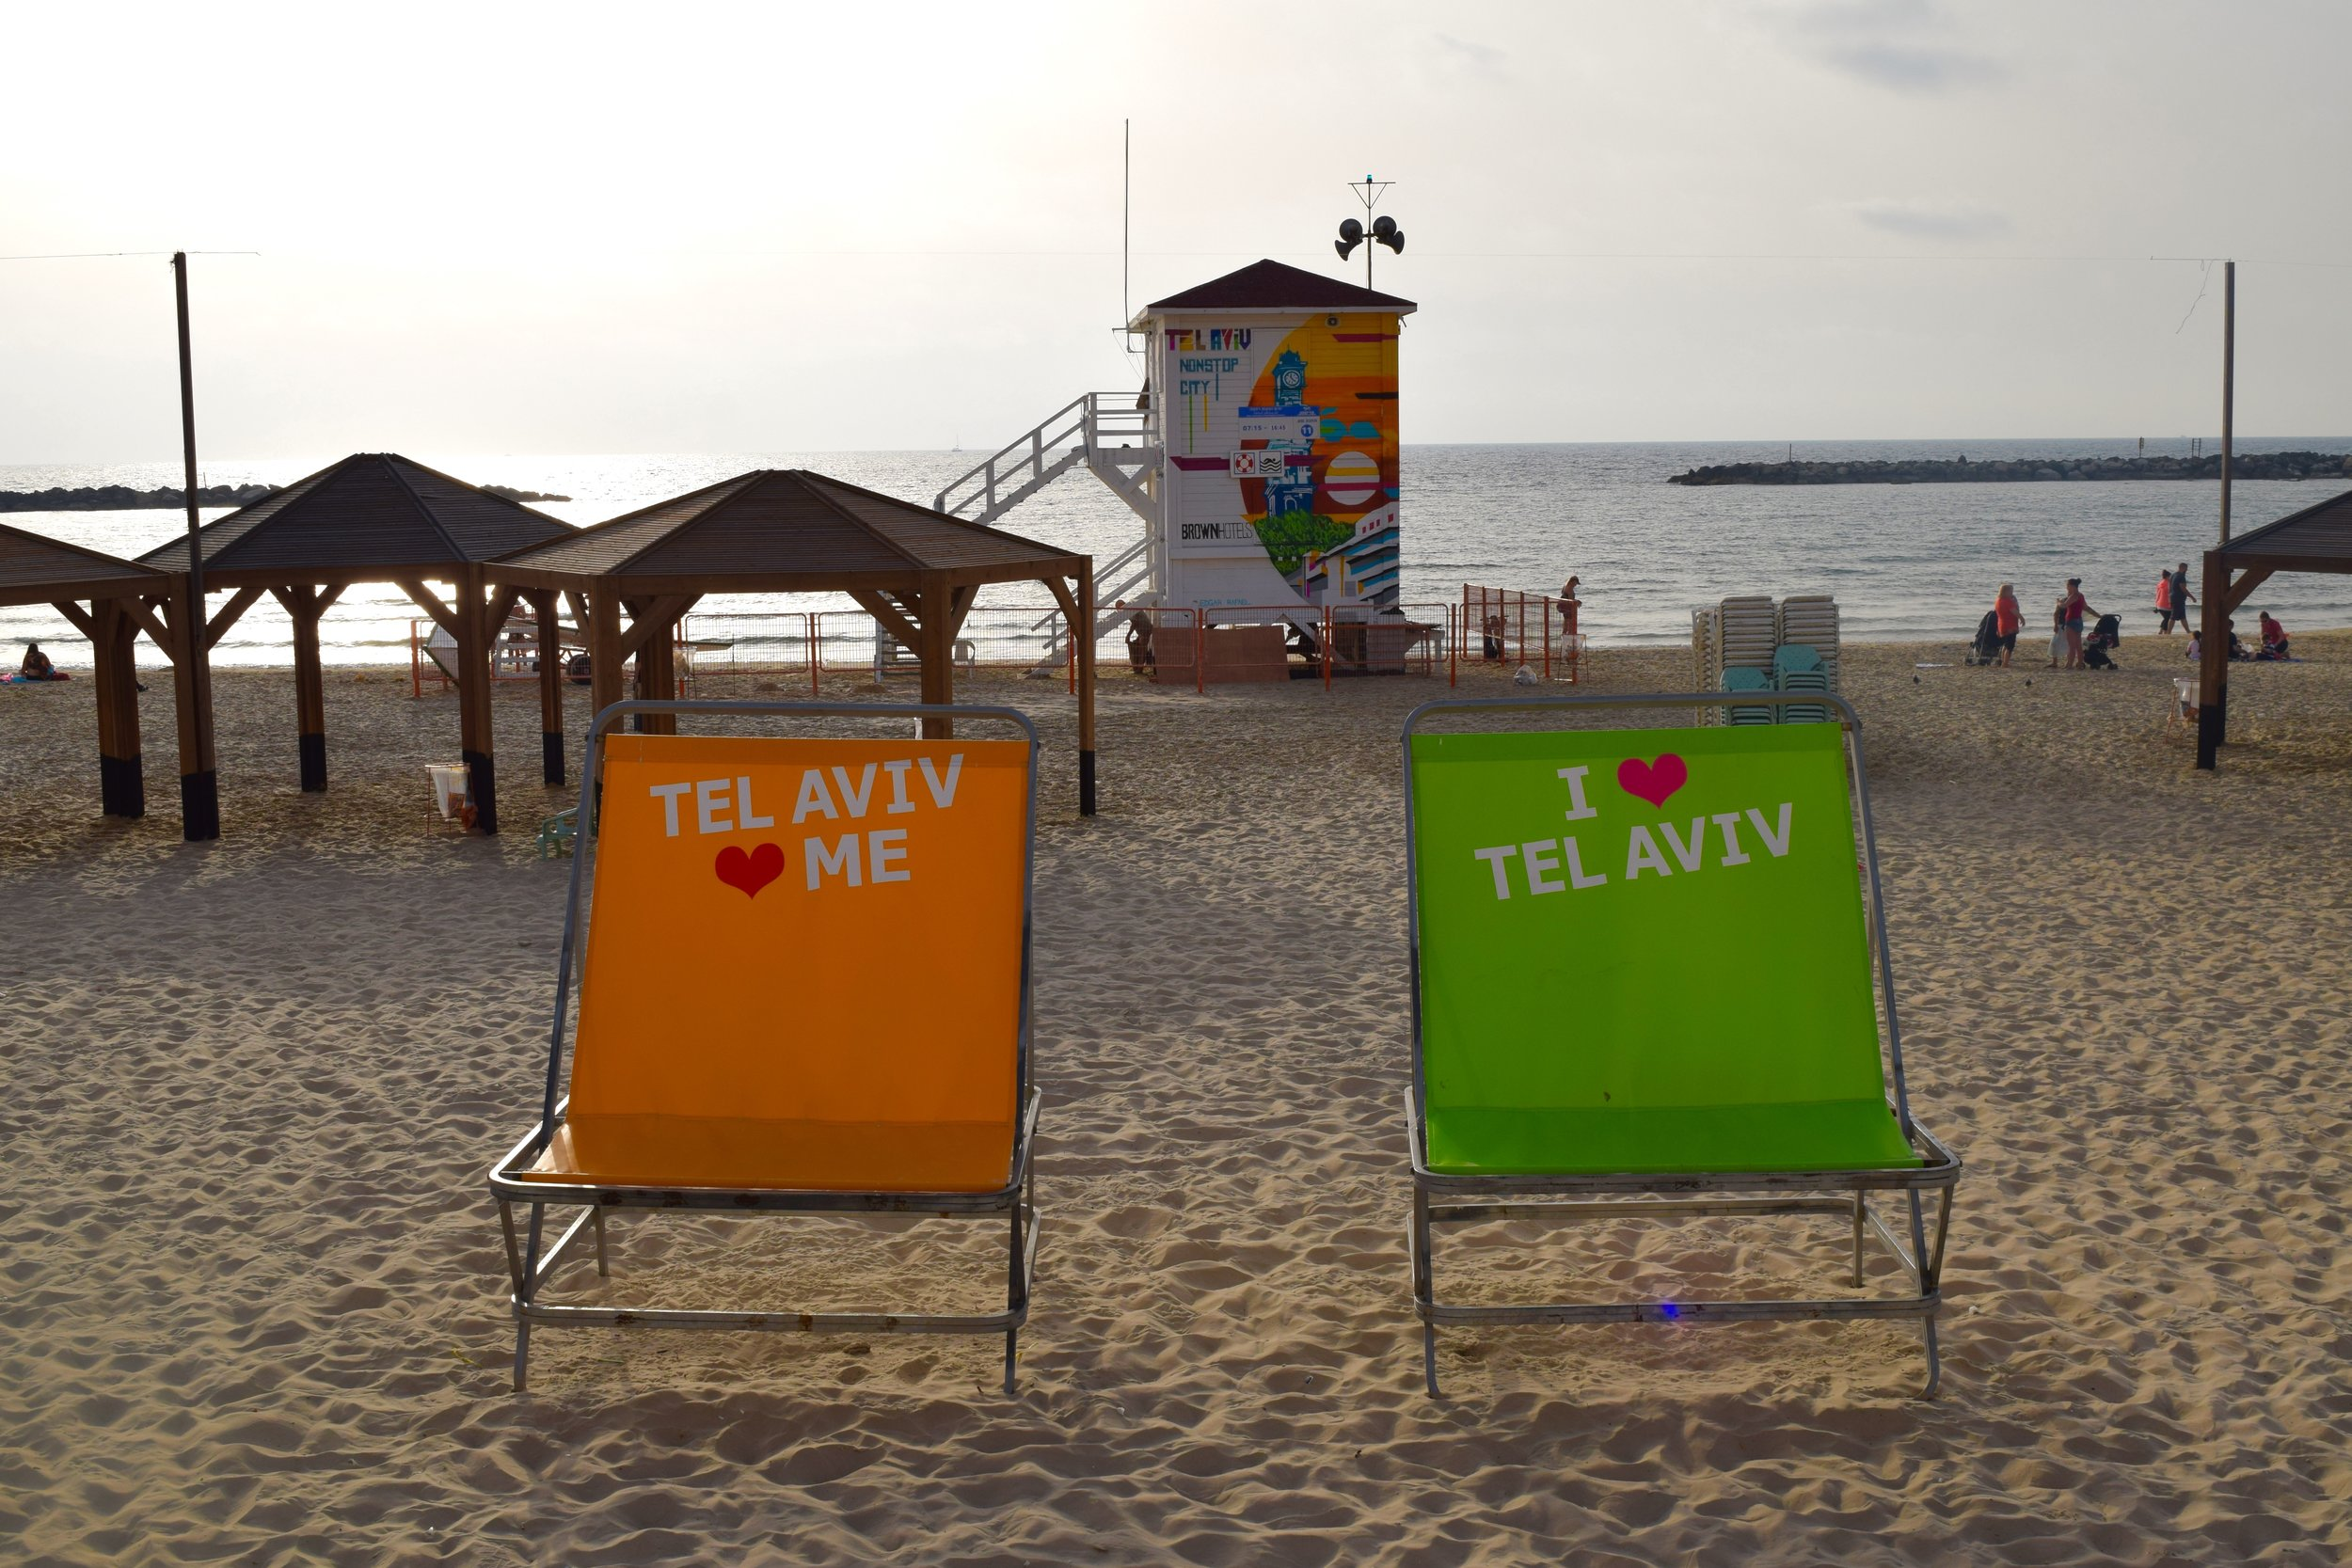 Sillas gigantes en la playa de Tel Aviv